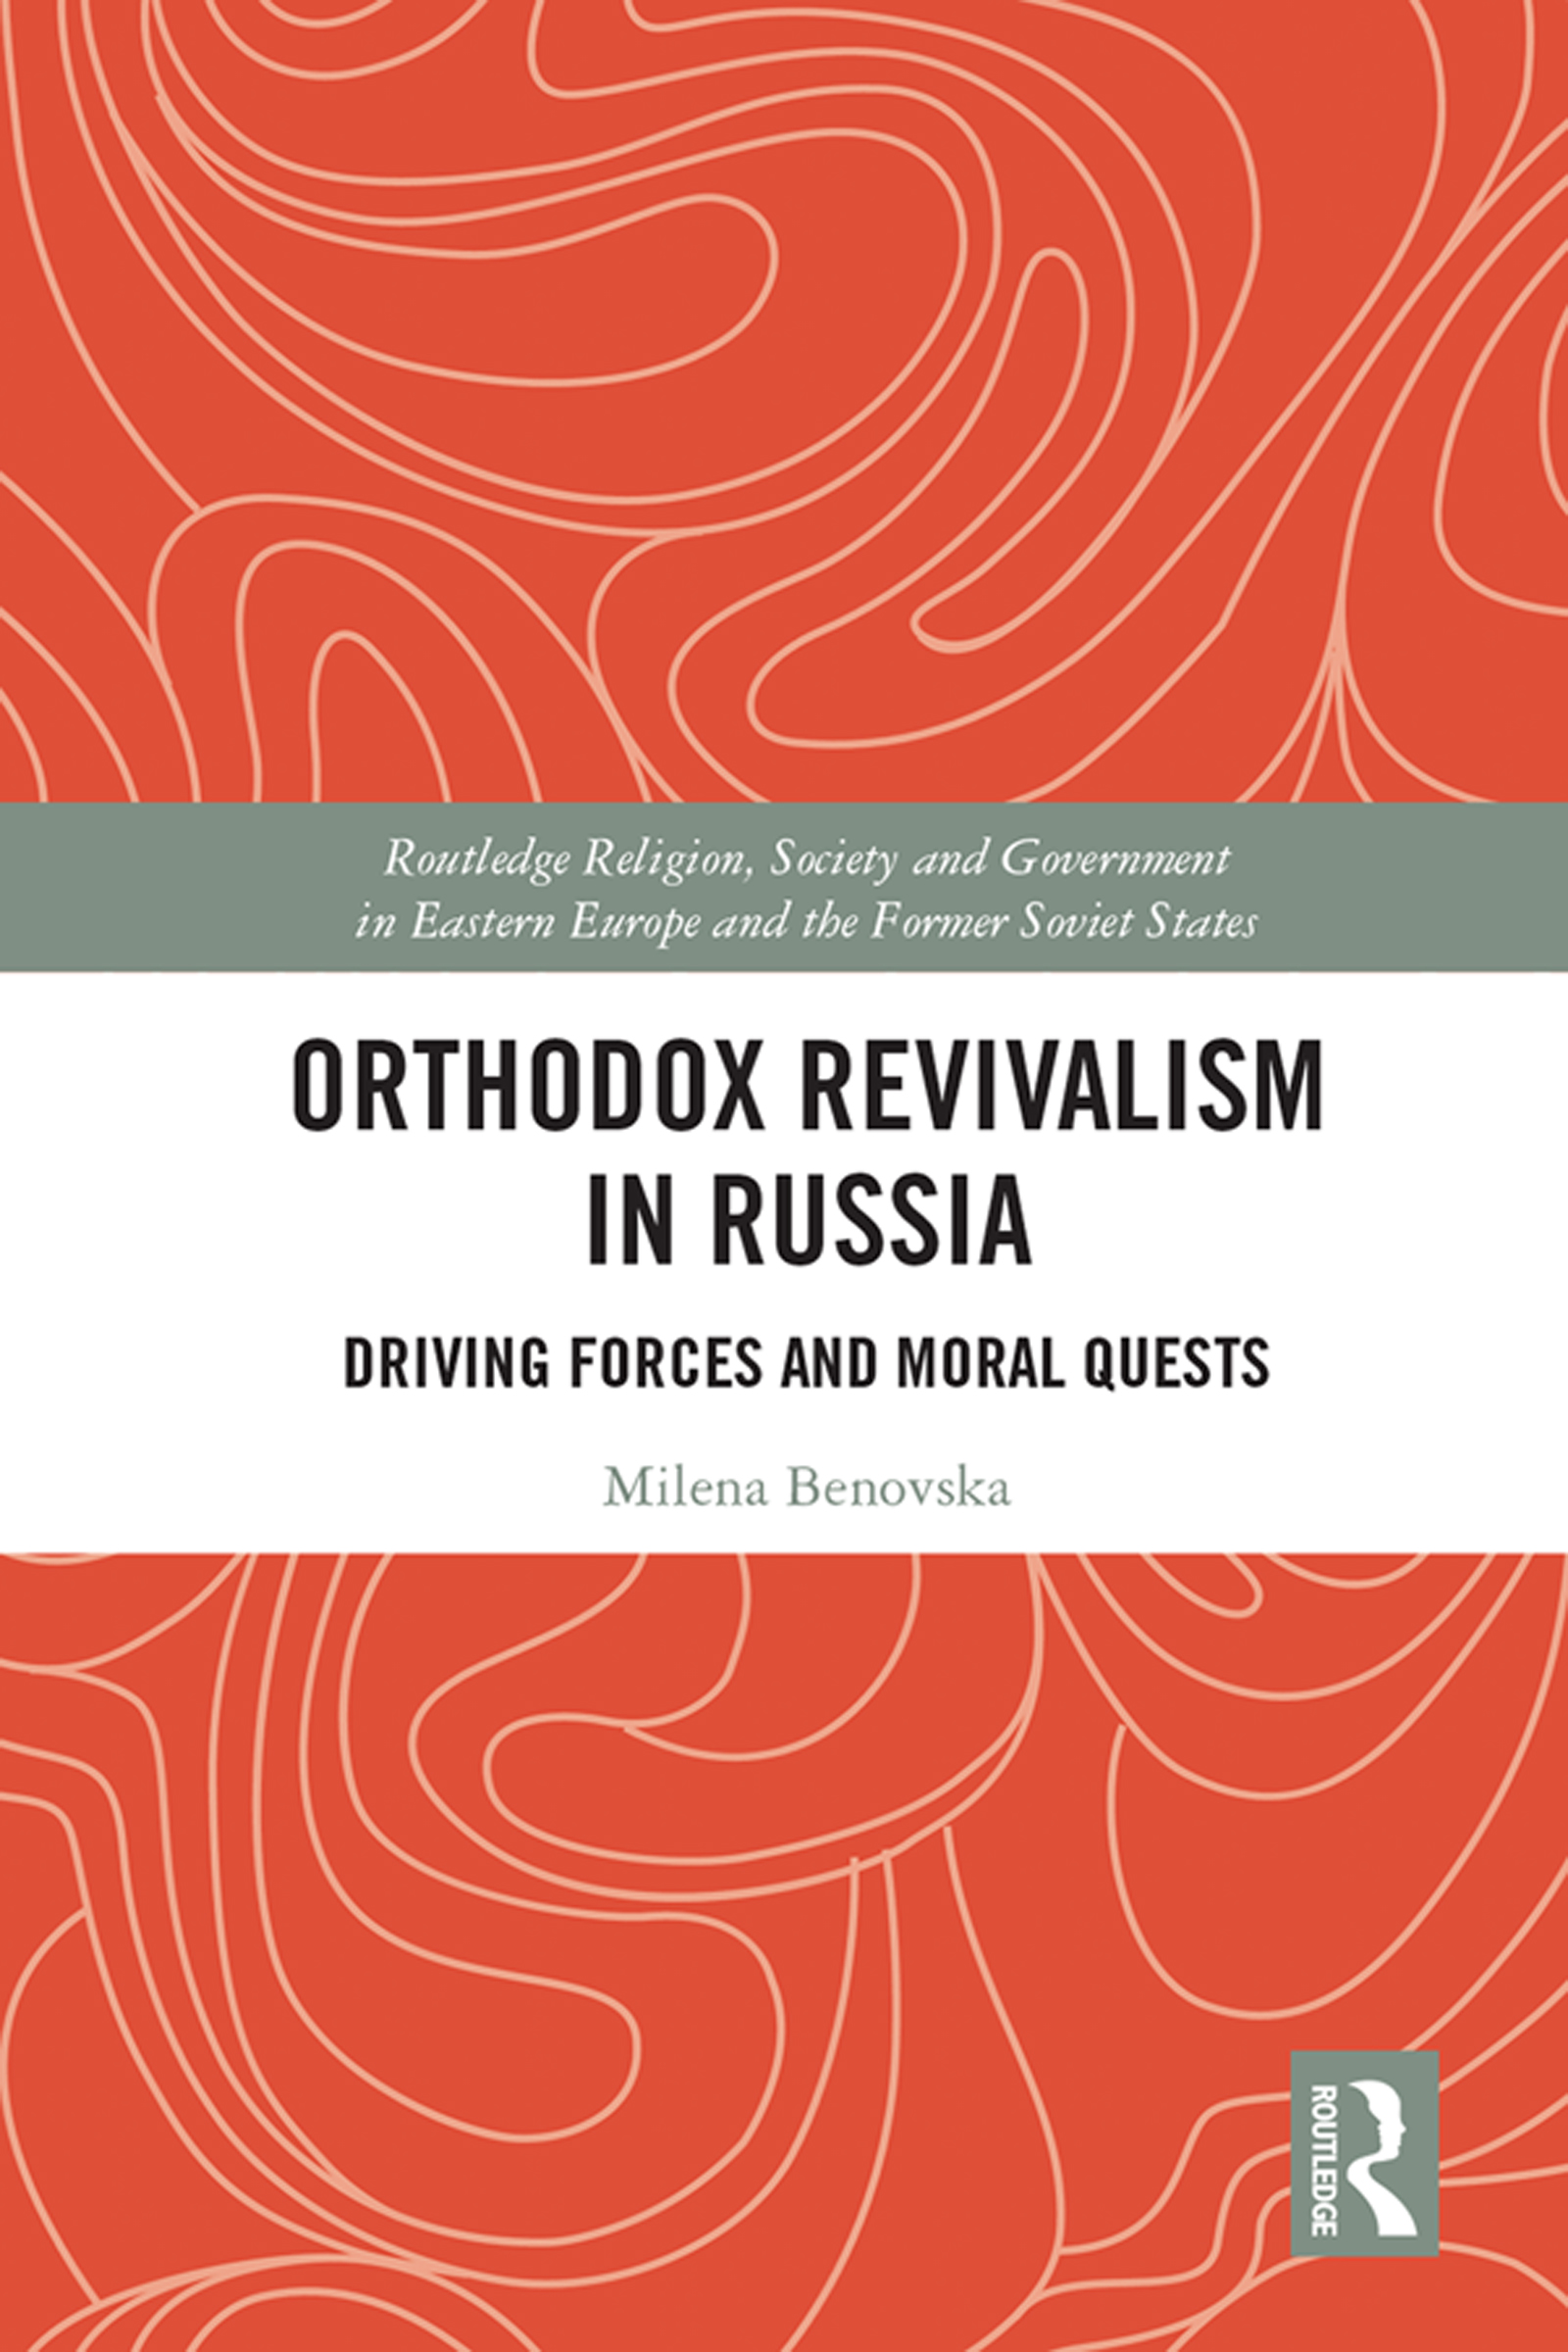 Orthodox Revivalism in Russia